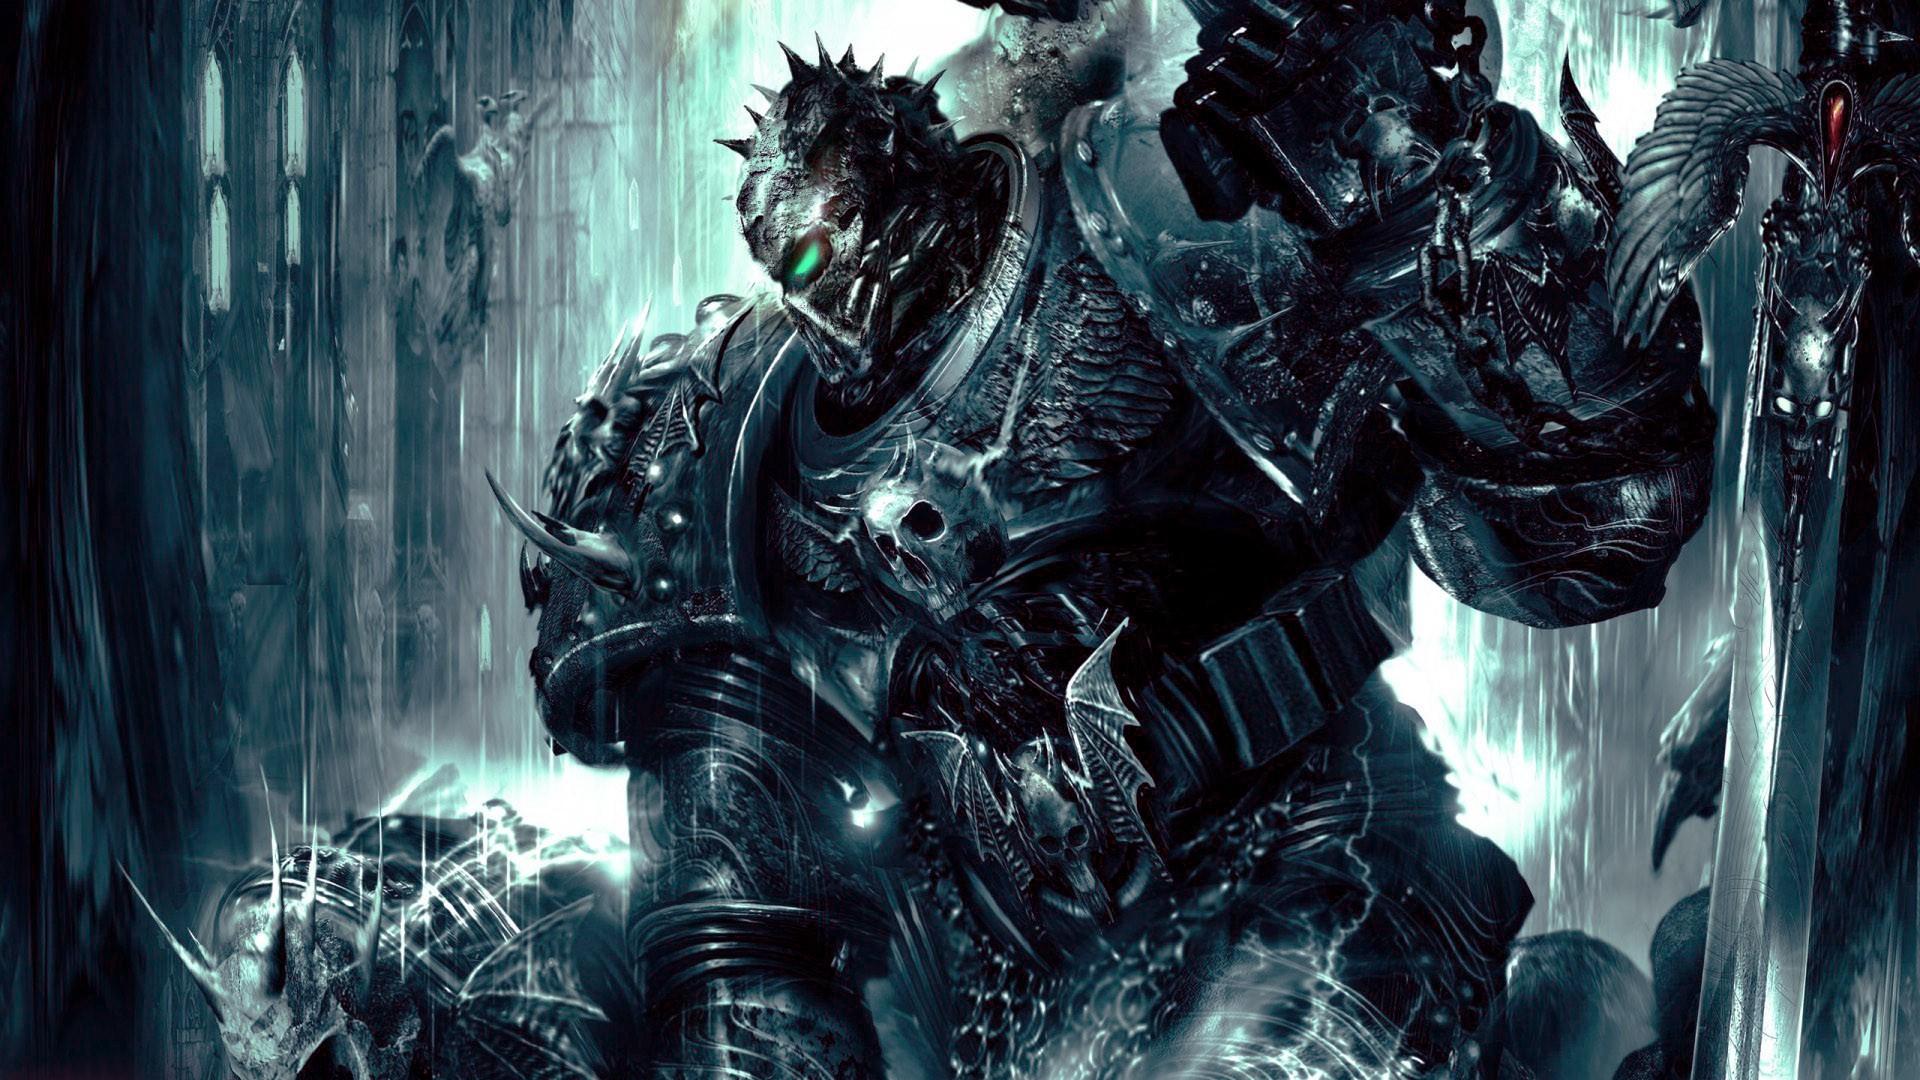 General 1920x1080 Chaos Space Marine Warhammer 40,000 creature Chaos